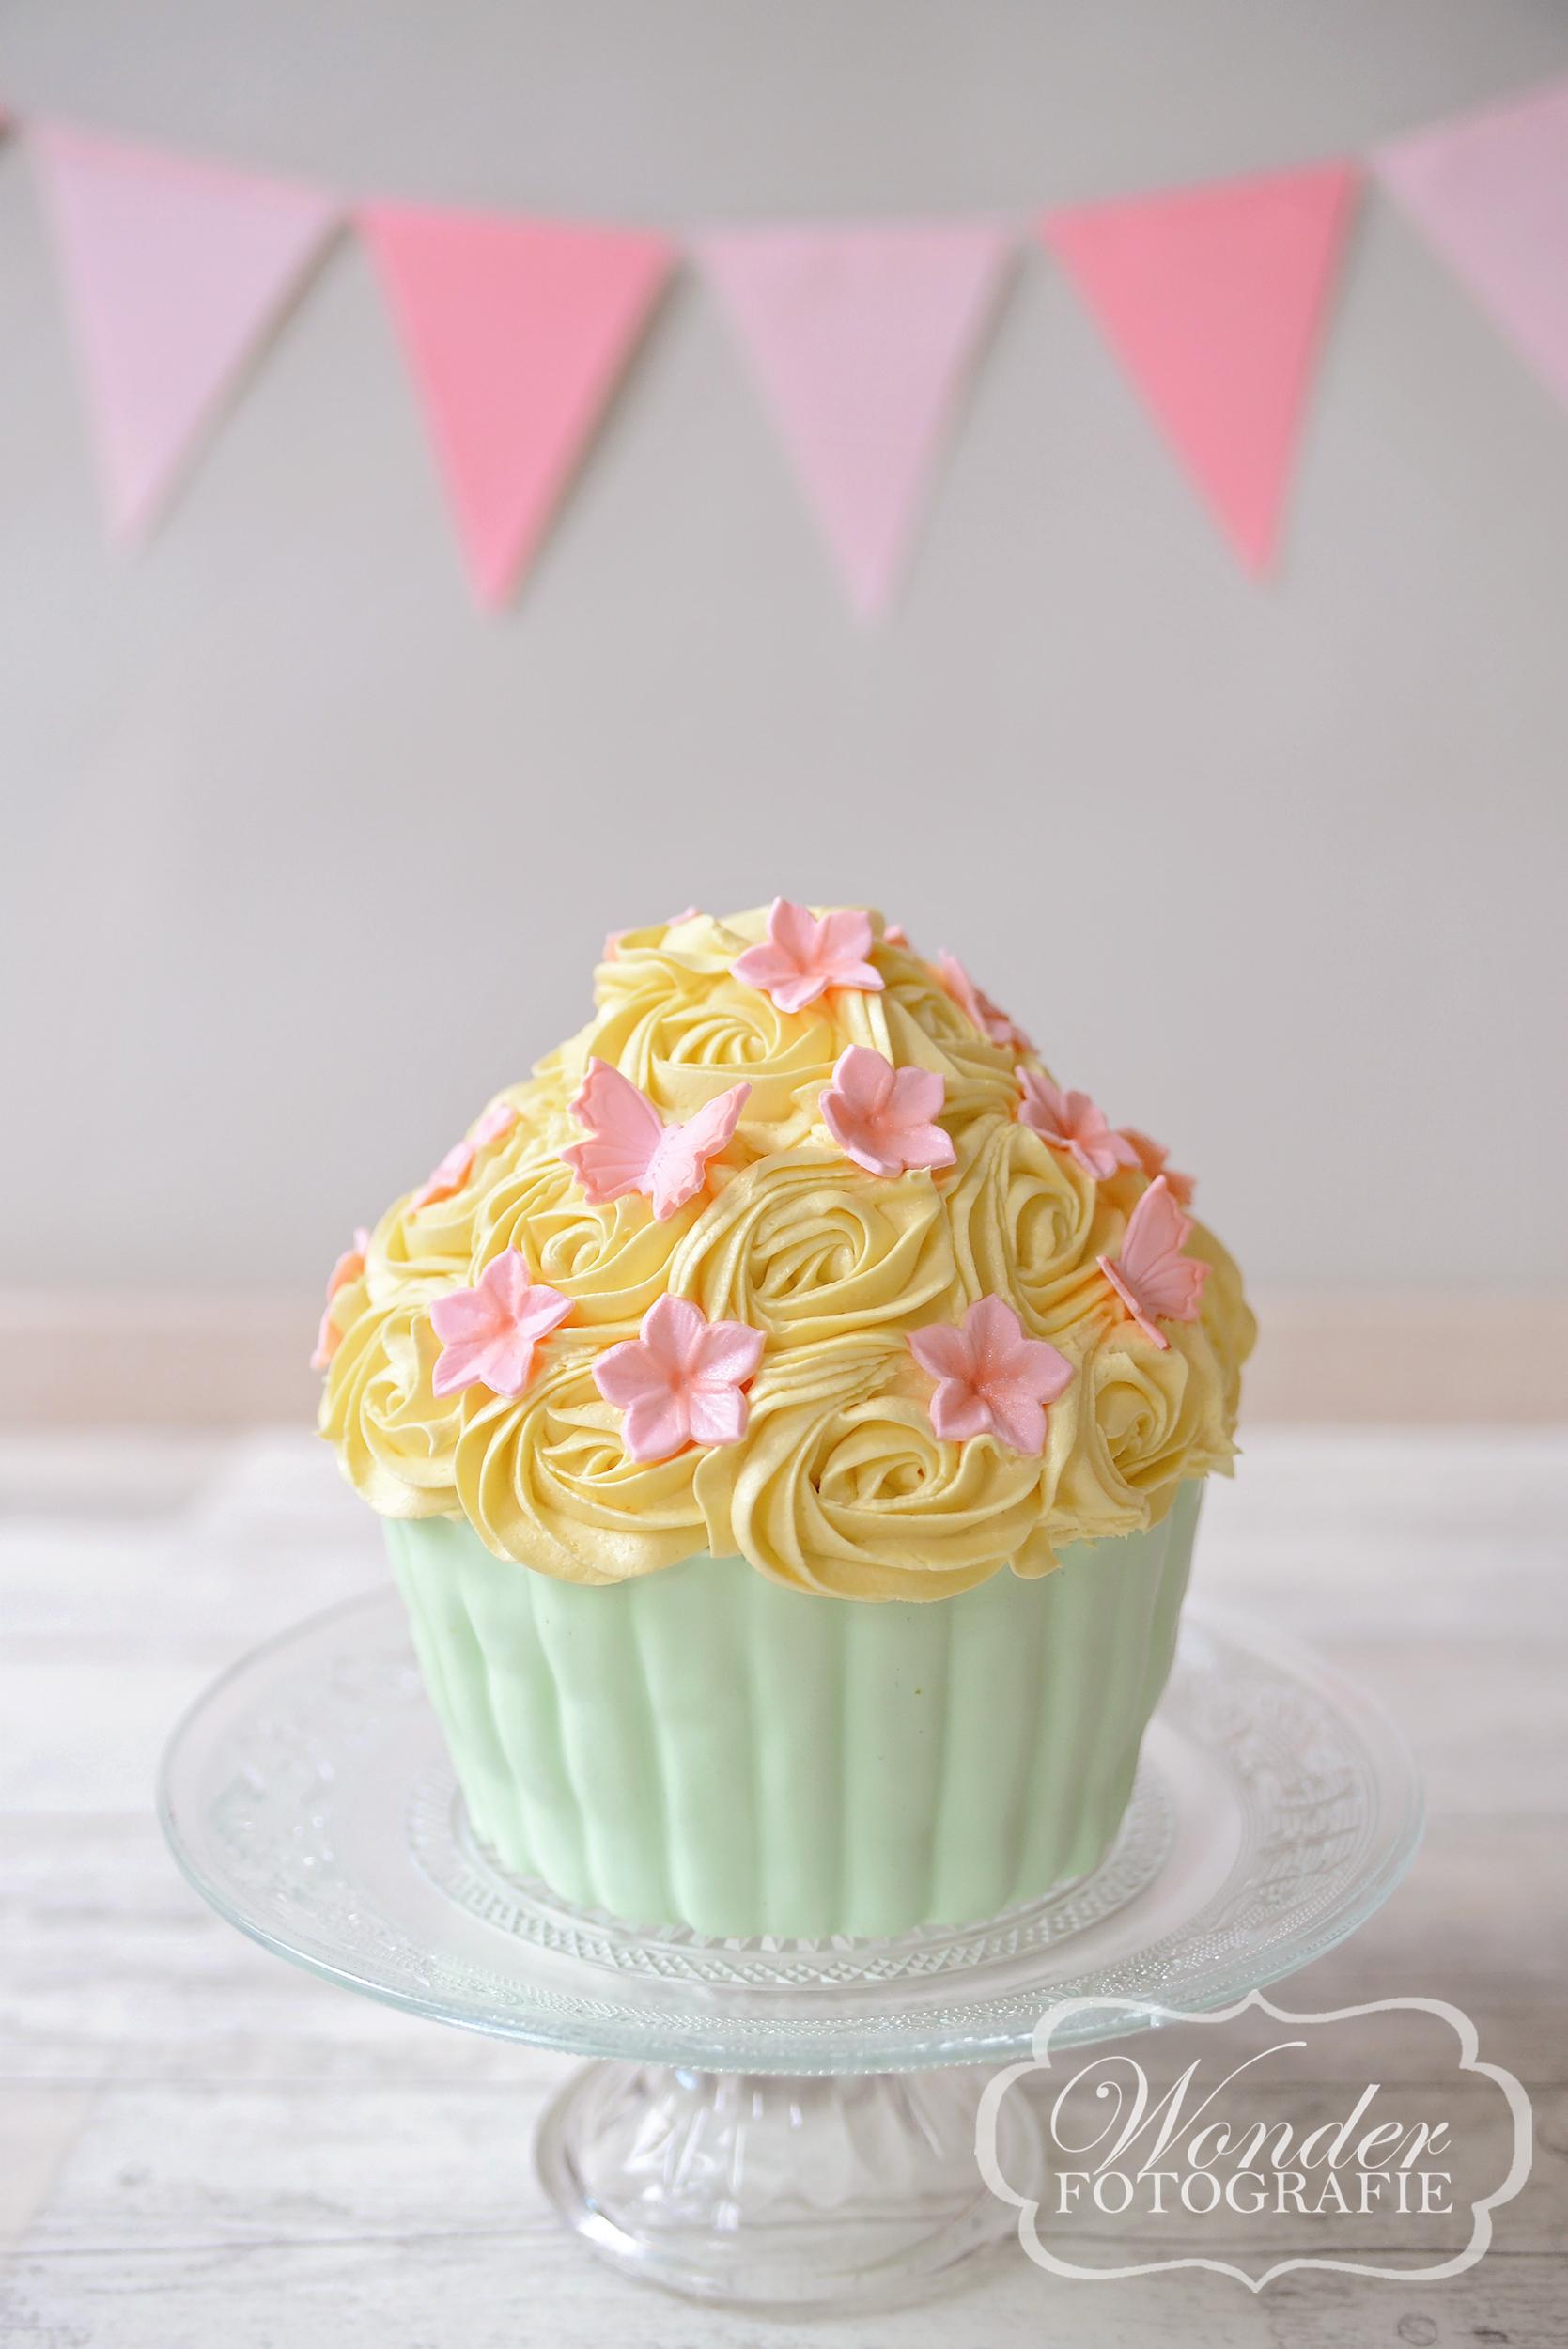 Cake Smash GroenGeelRoze - Wonder Fotografie